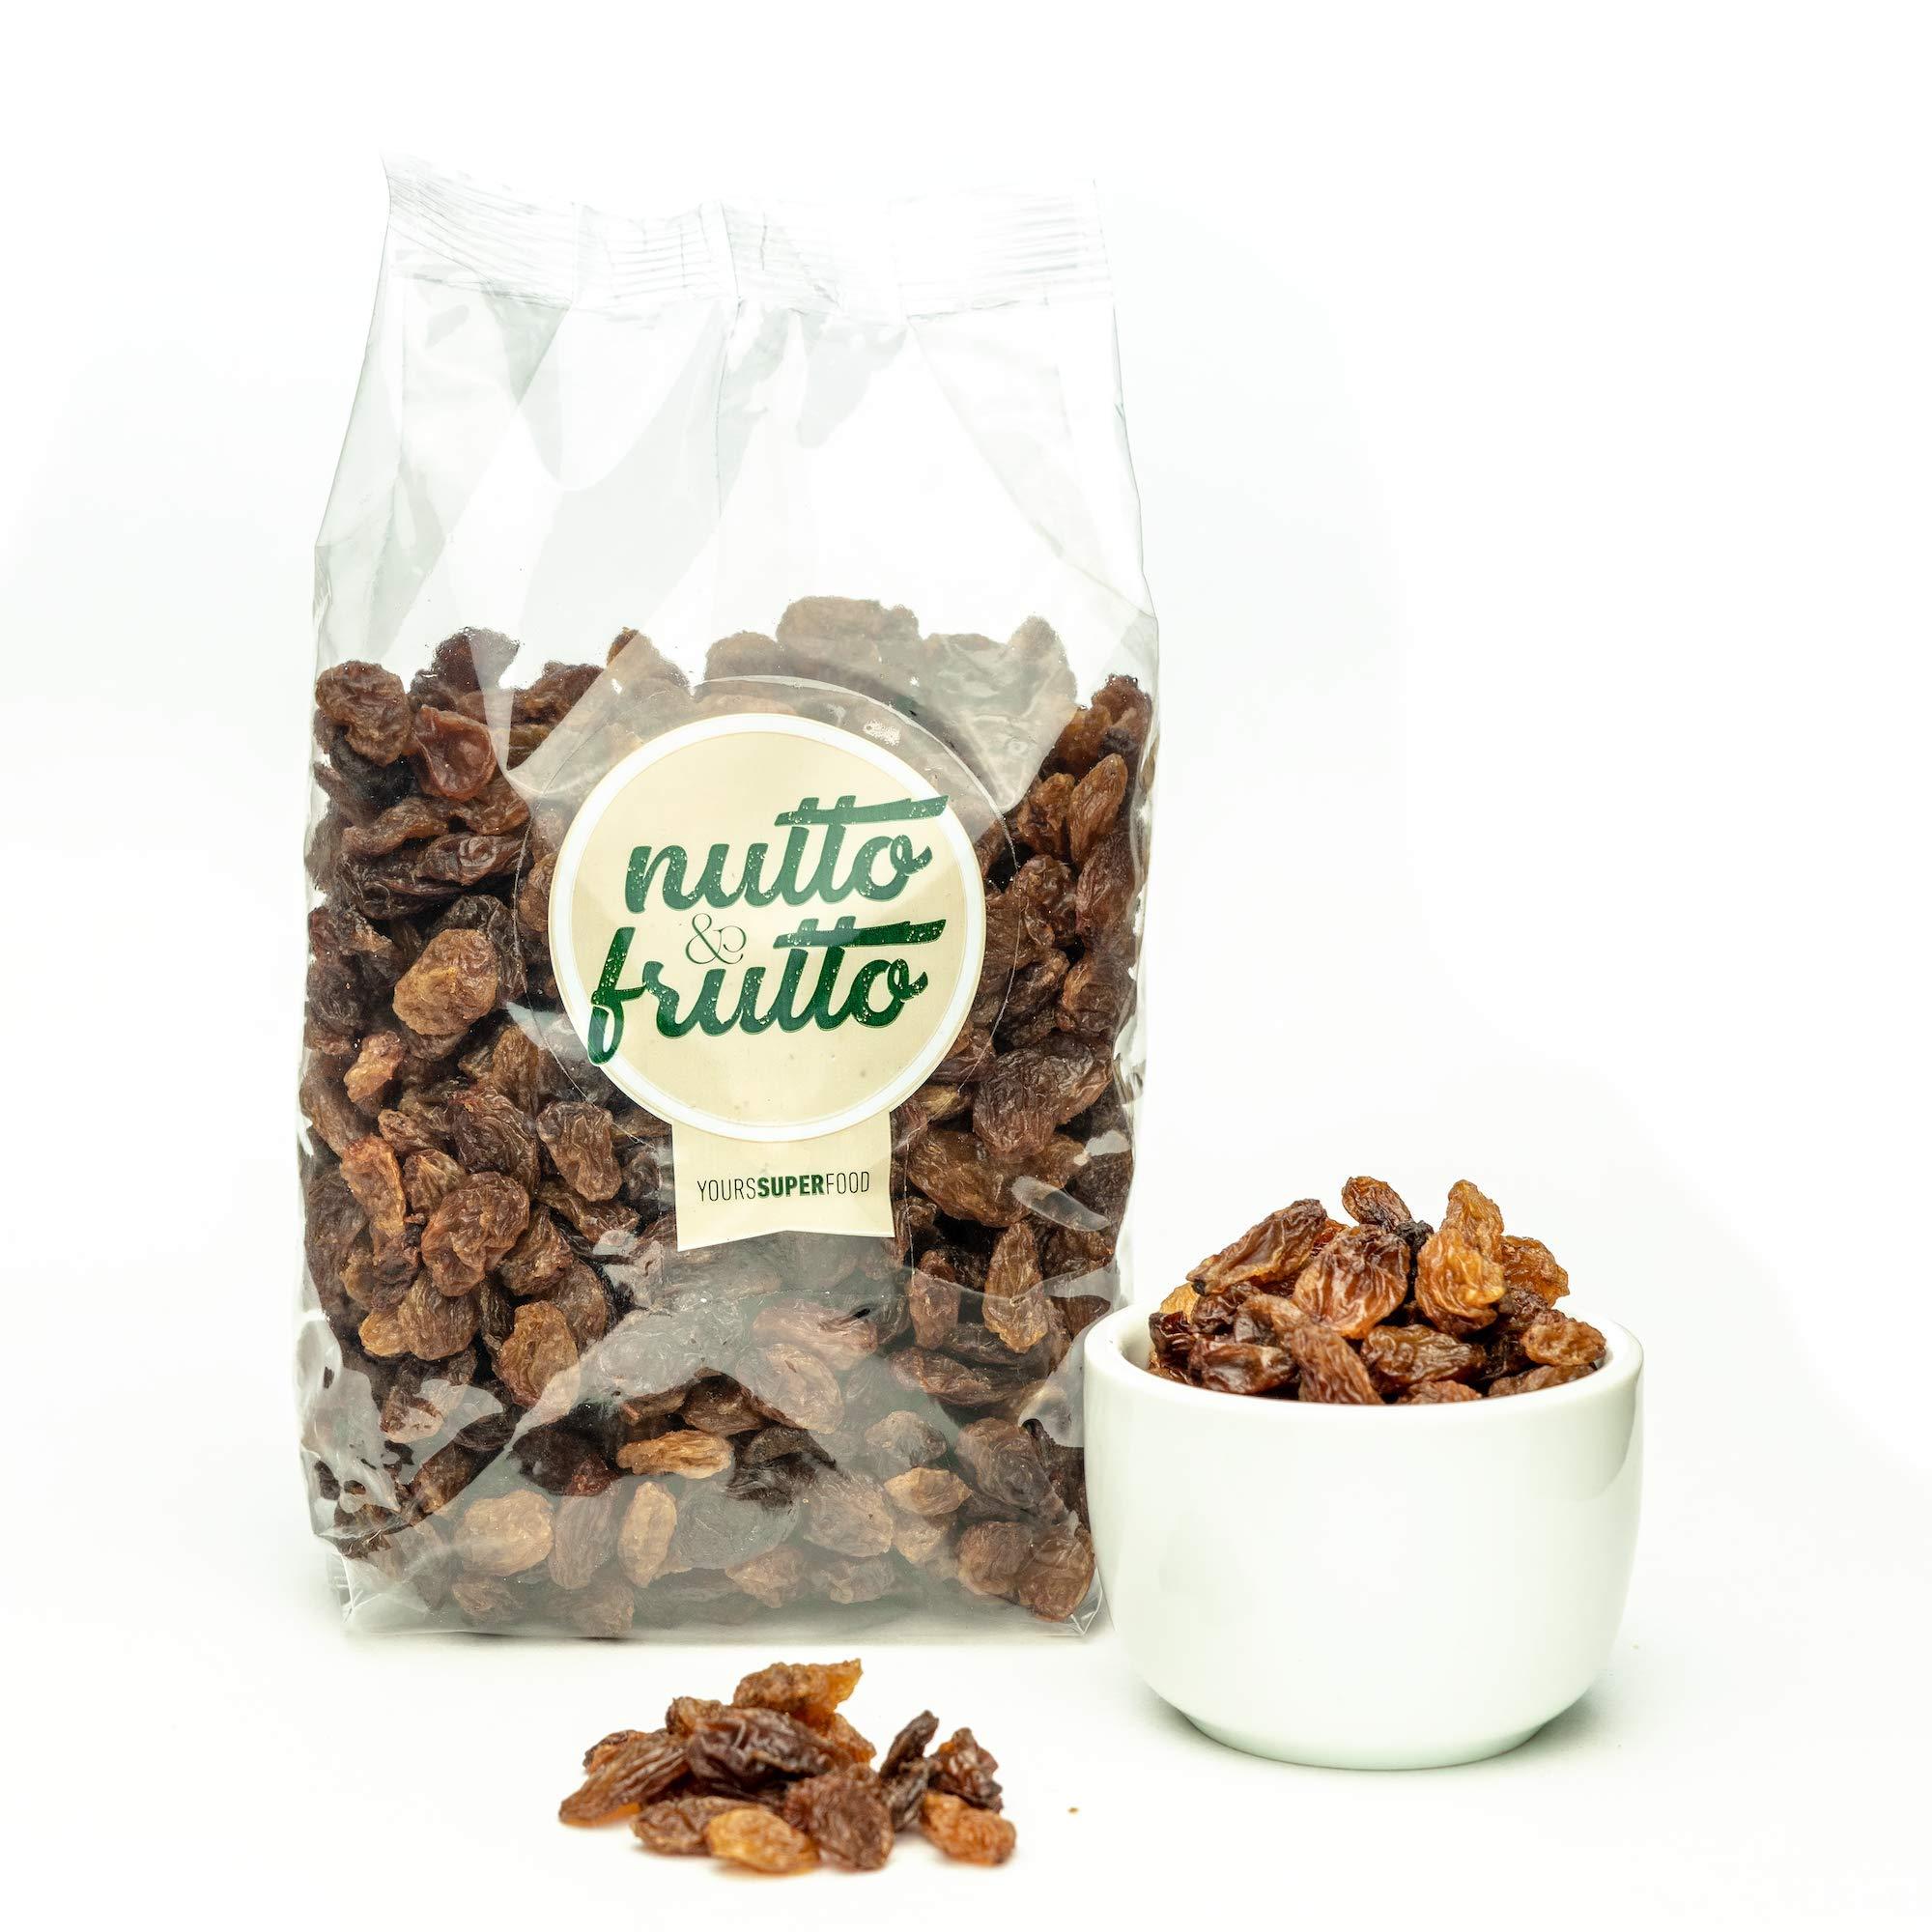 Sultana Raisins By Nutto Frutto Healthy Dried Fruit Bag Full Of Dried Sultana Raisins Seedless Dried Raisins 16 oz (450 gr) by Nutto Frutto